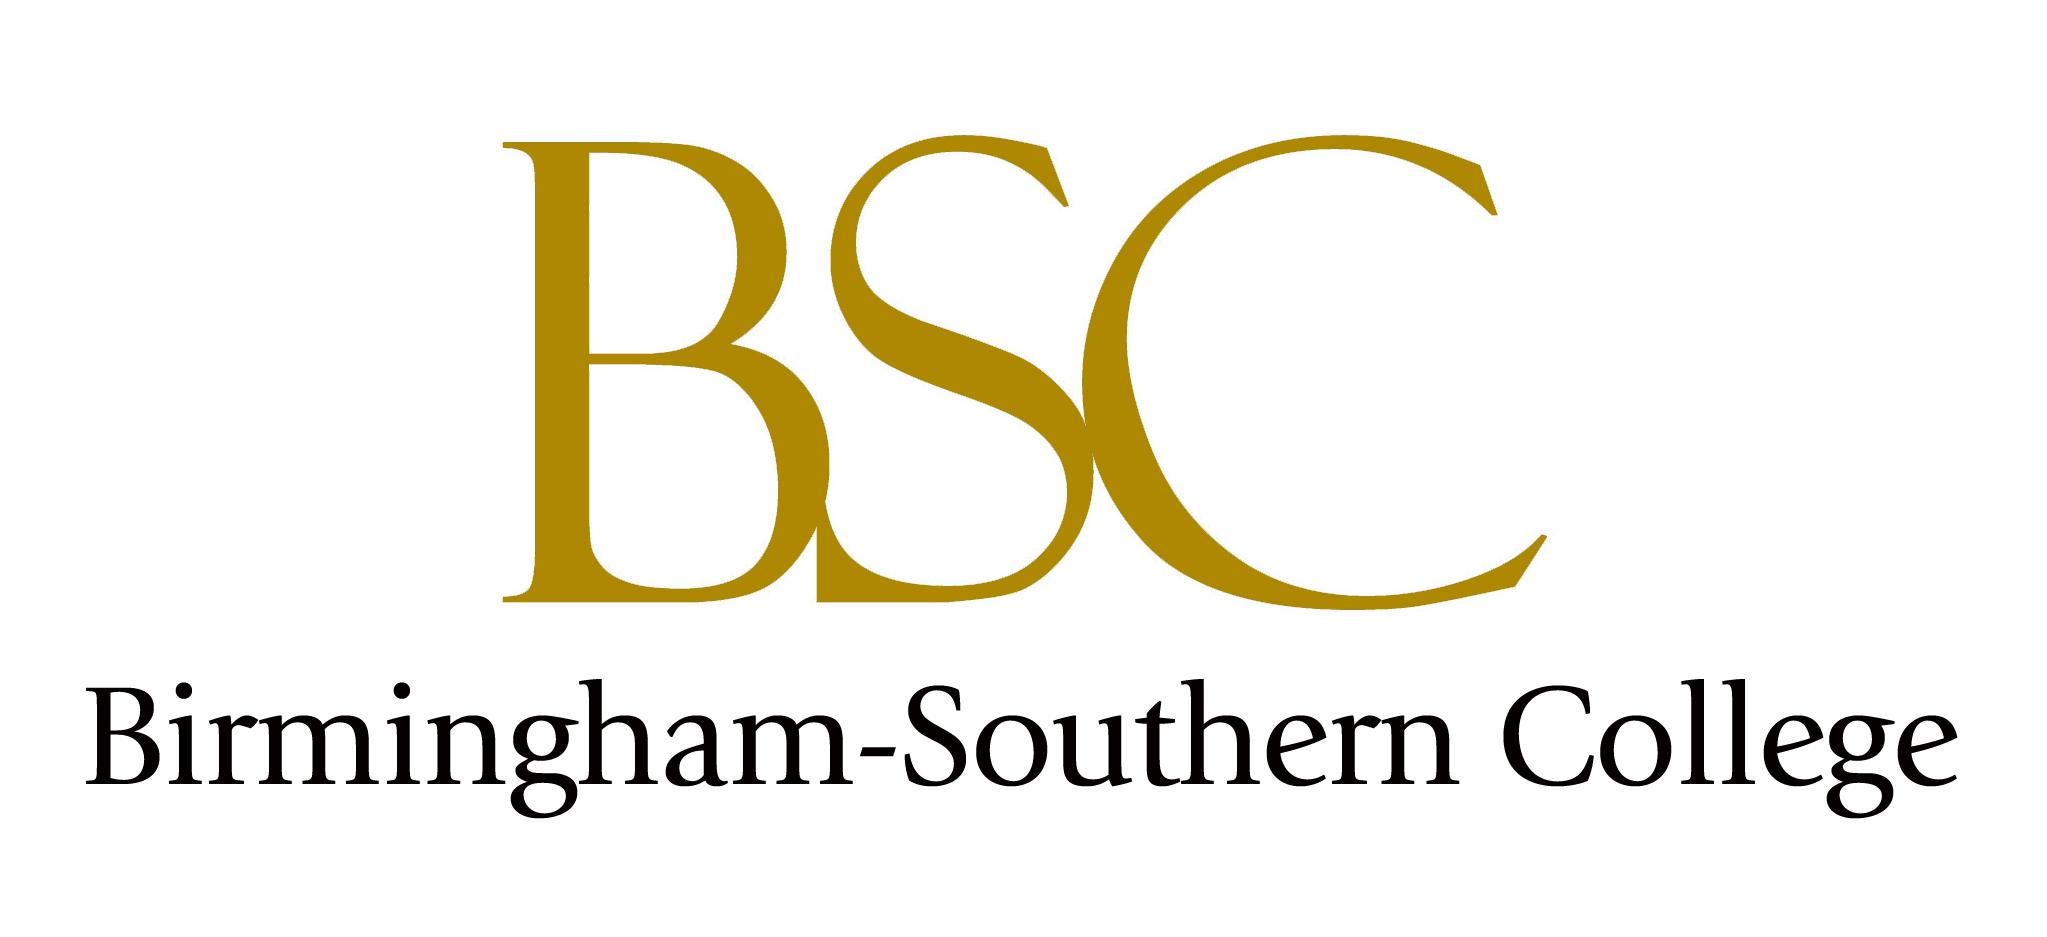 University Organization Logos